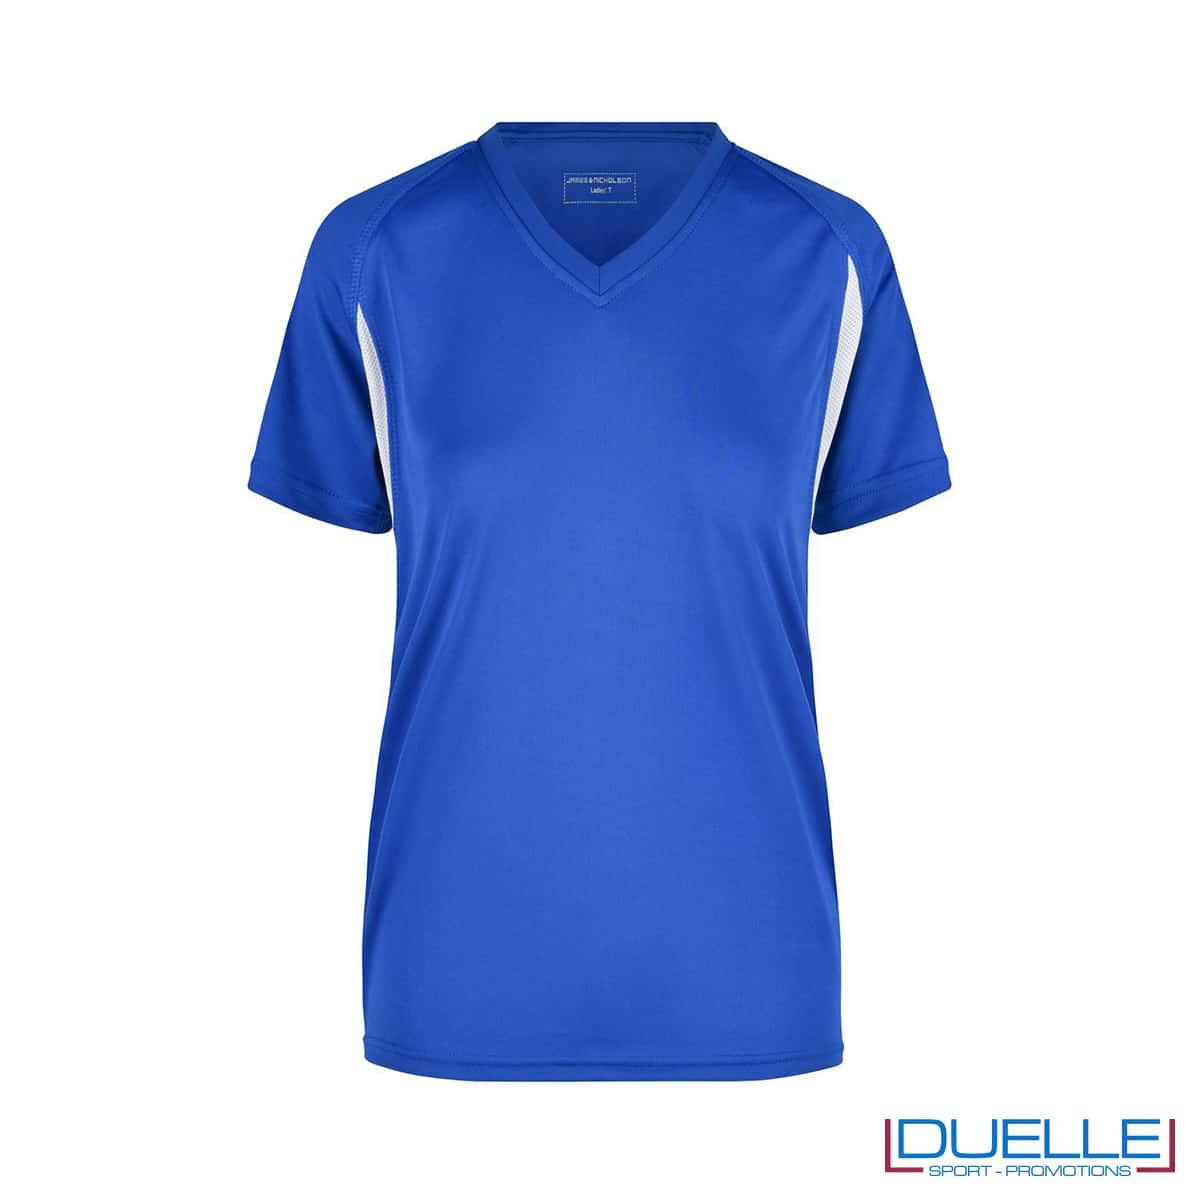 T-shirt running donna personalizzata colore blu royal-bianco